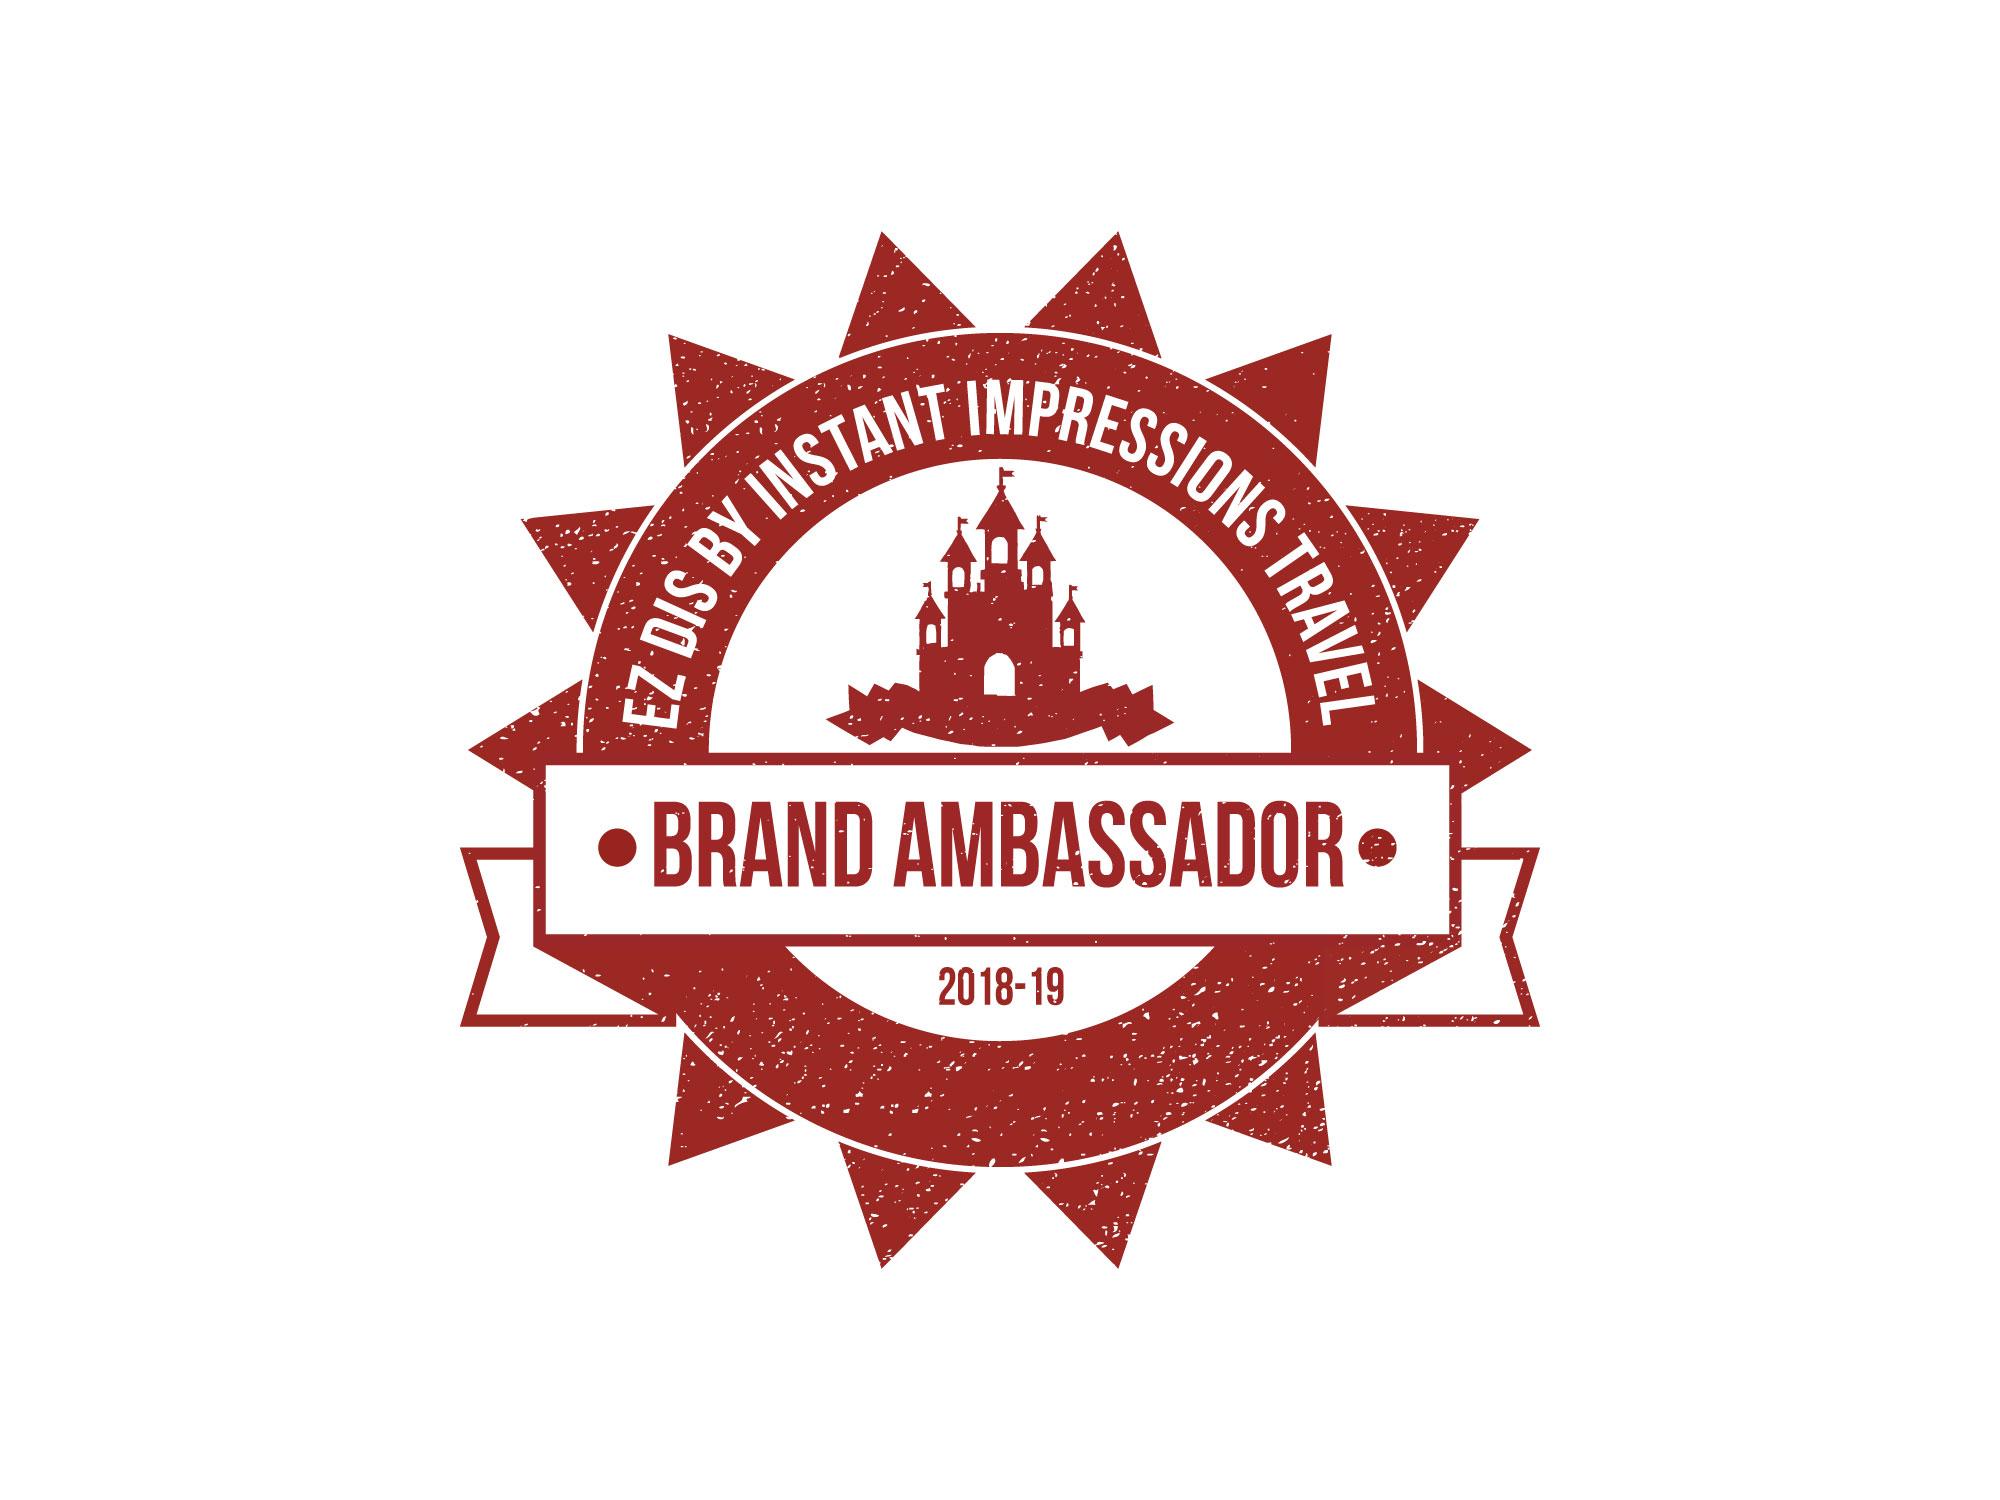 ambassador logo 2018-19 ez dis